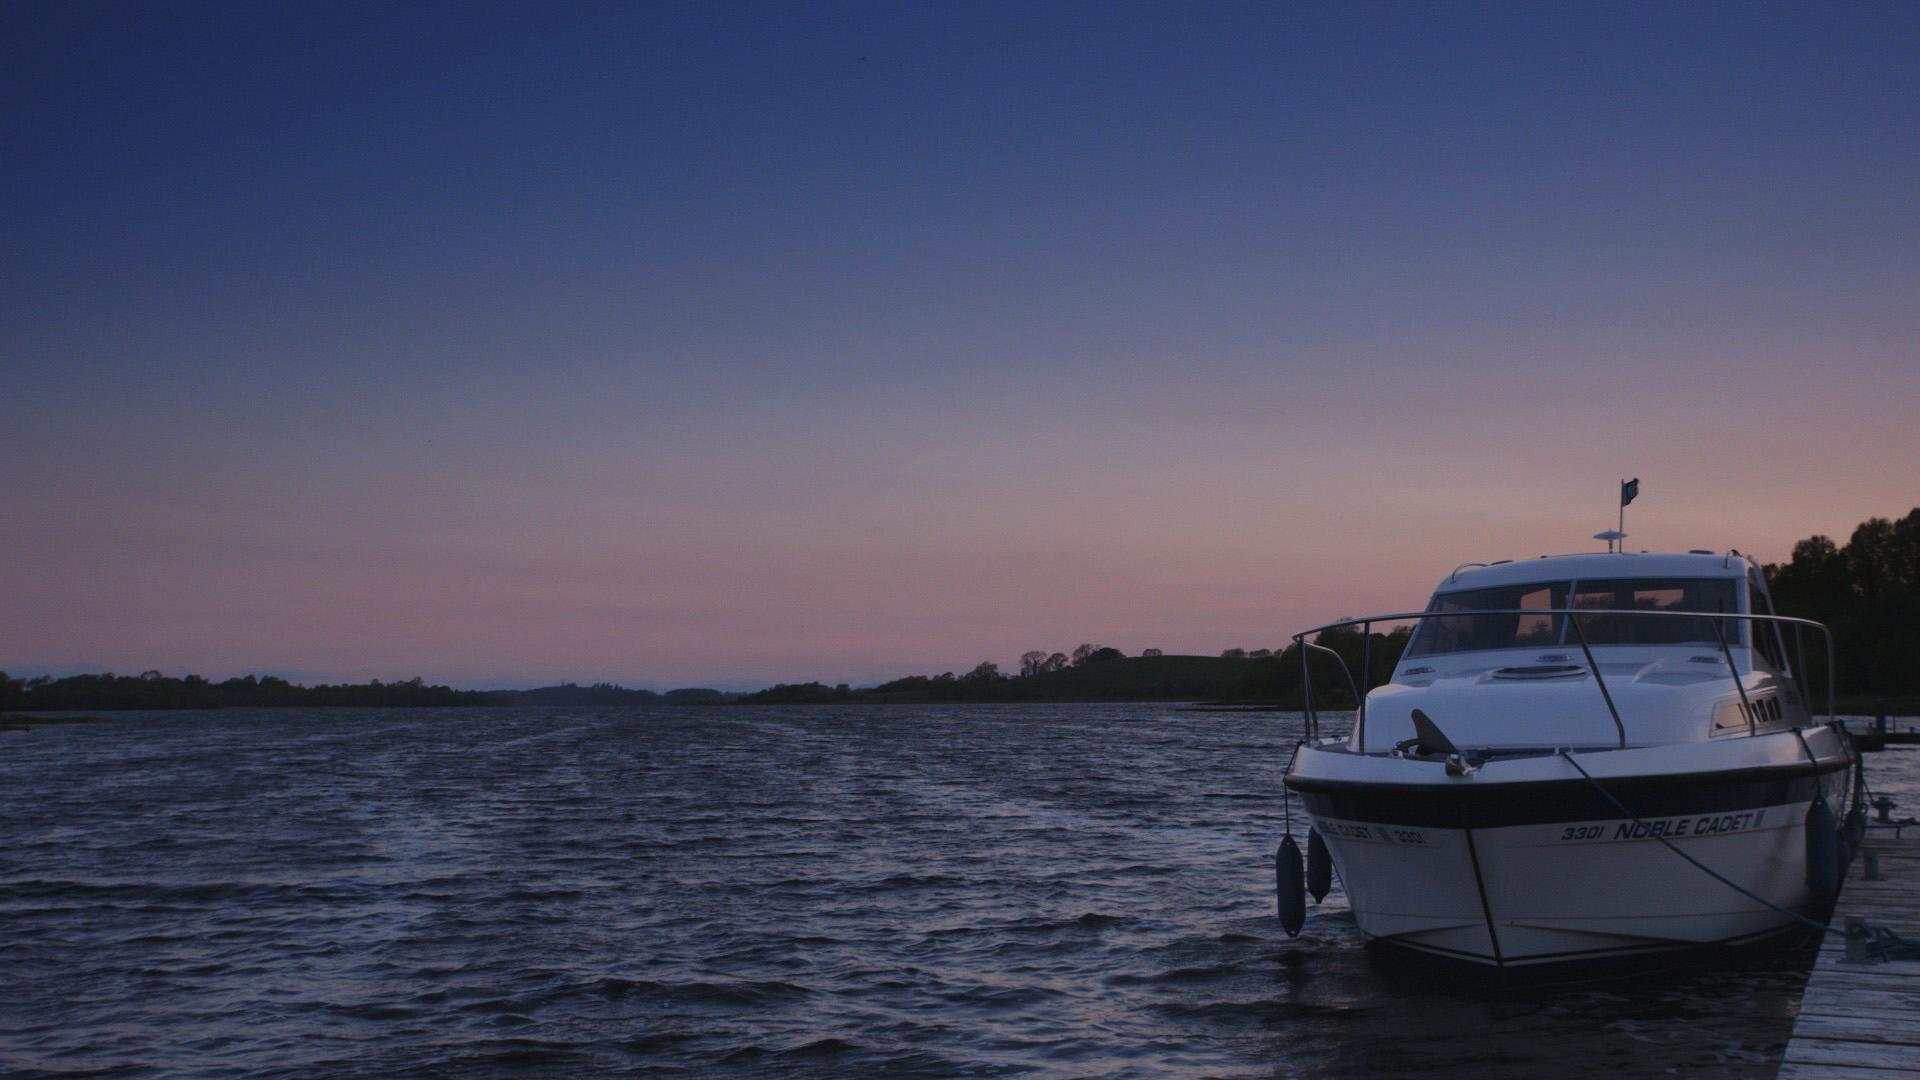 fermanagh_boat02